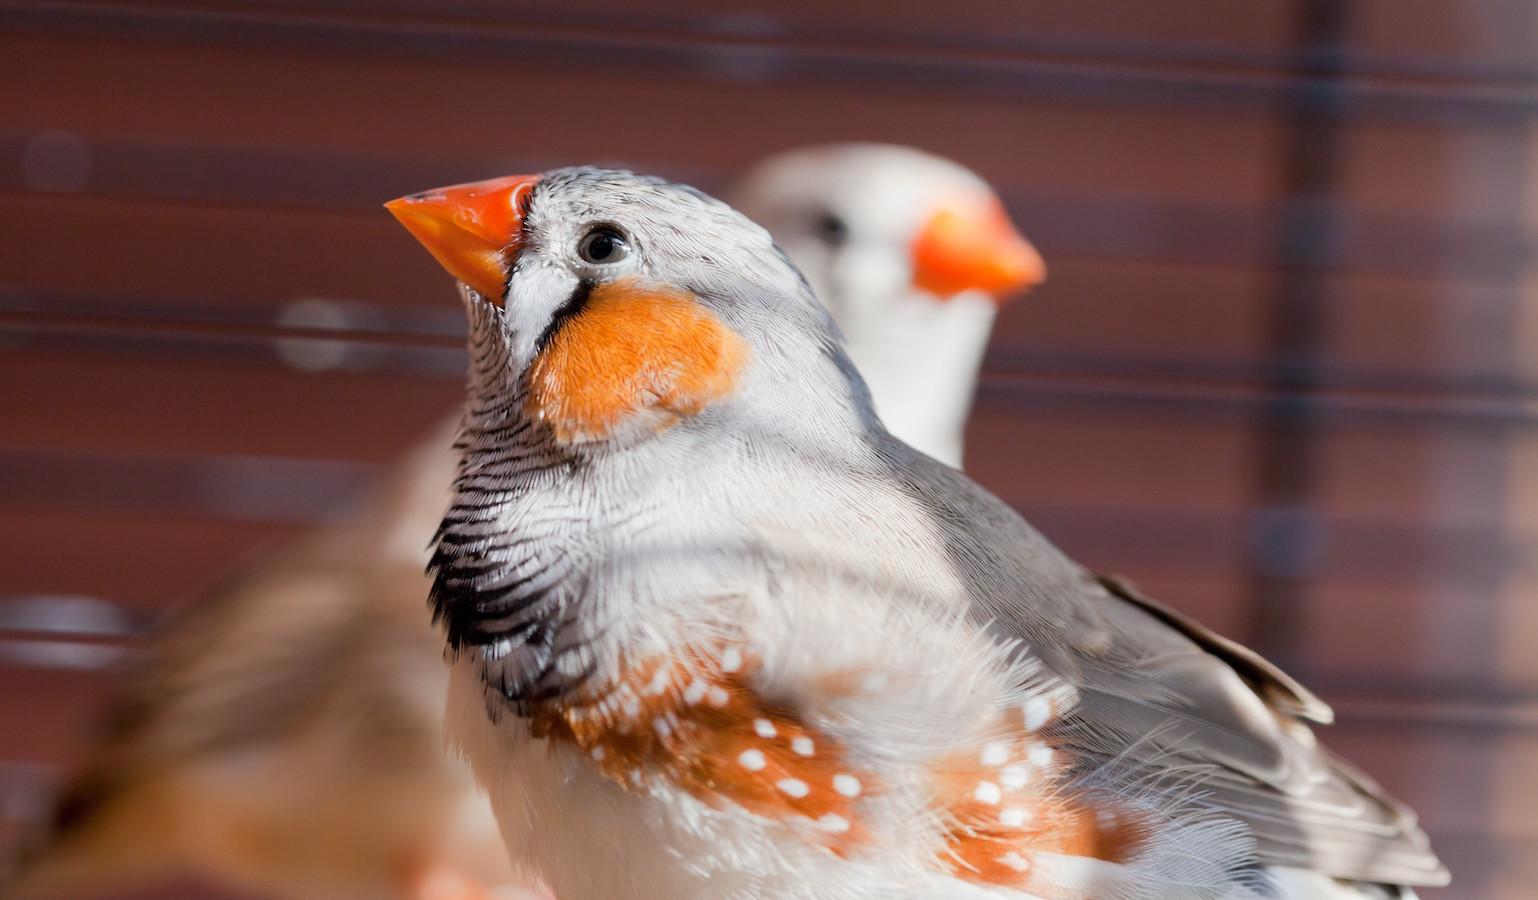 Cut-throat Finch - amadina fasciata - bird in cage